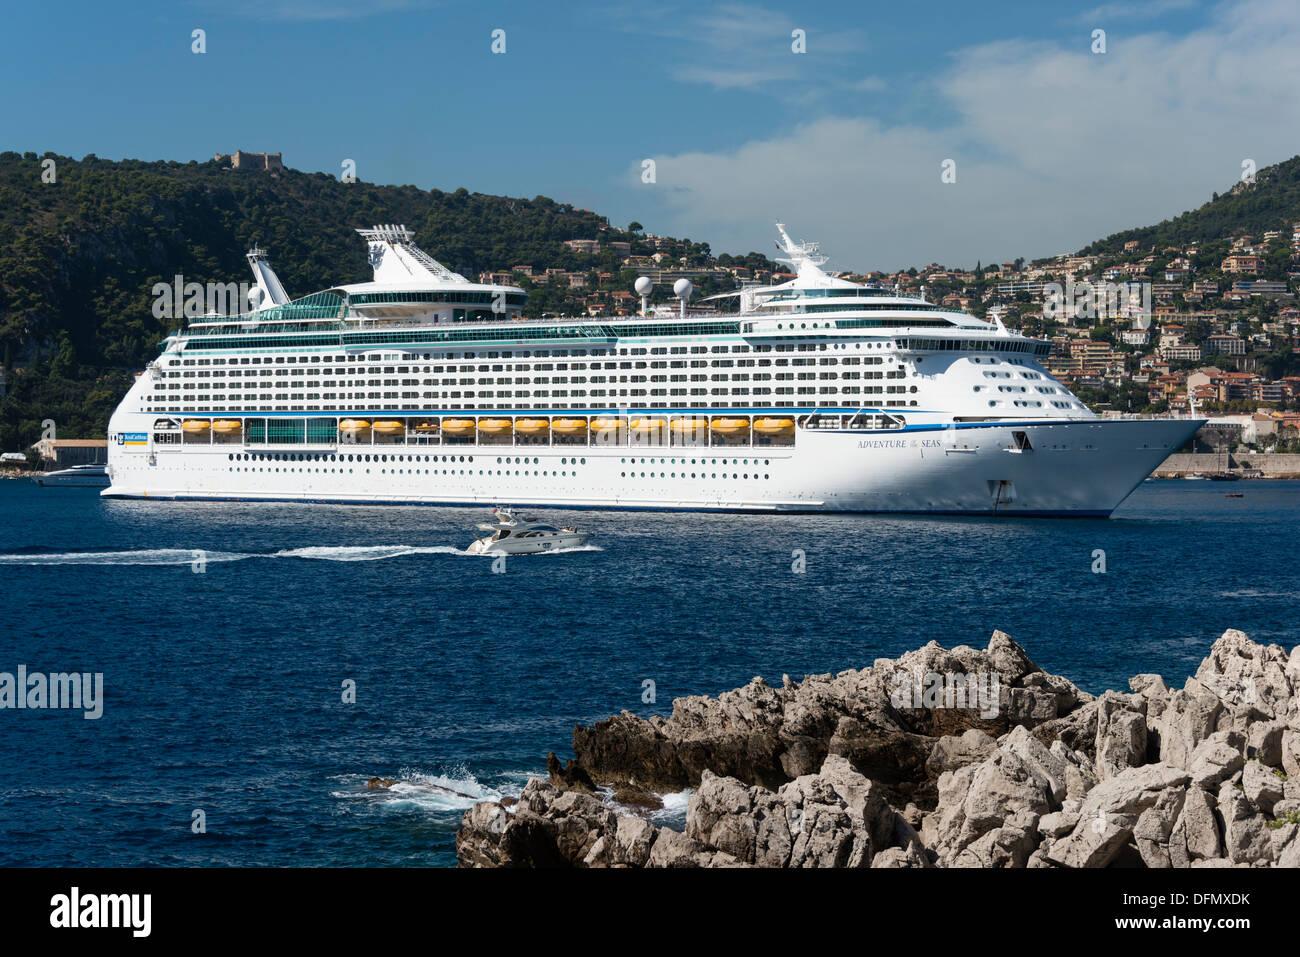 MS Adventure of the Seas - Stock Image